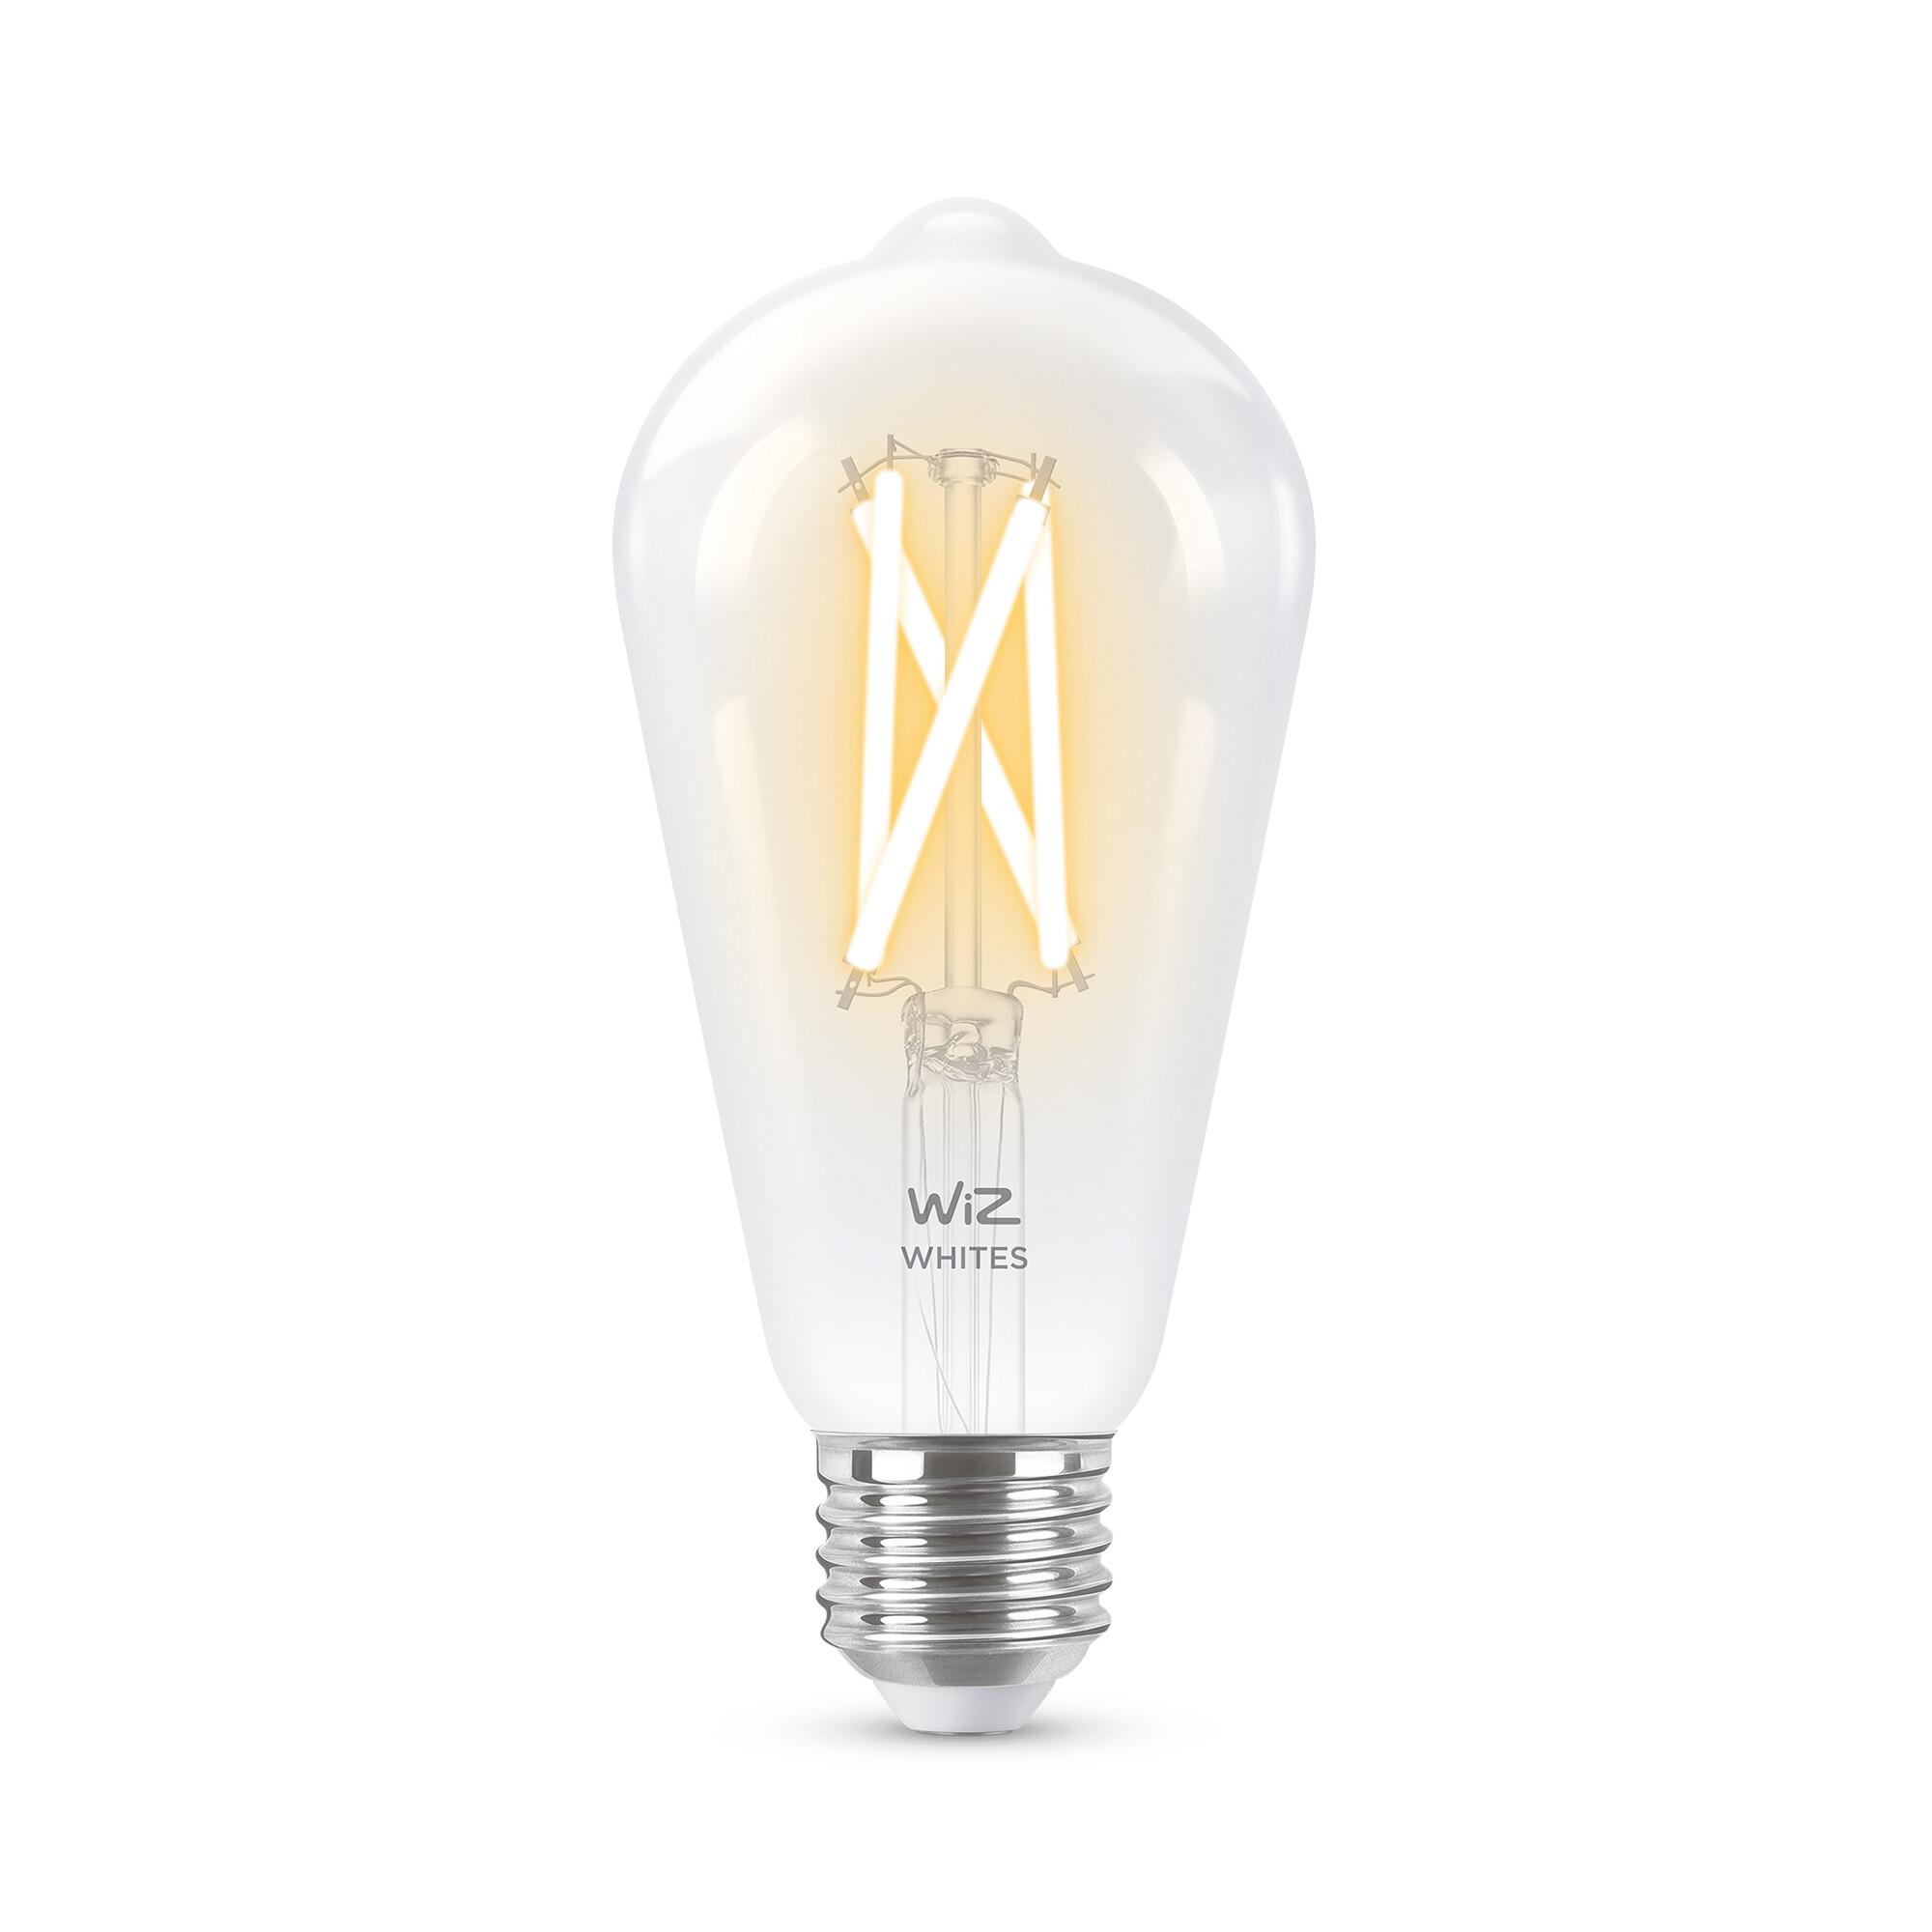 WiZ E27 60W 806lm 2700K Edison Transparant